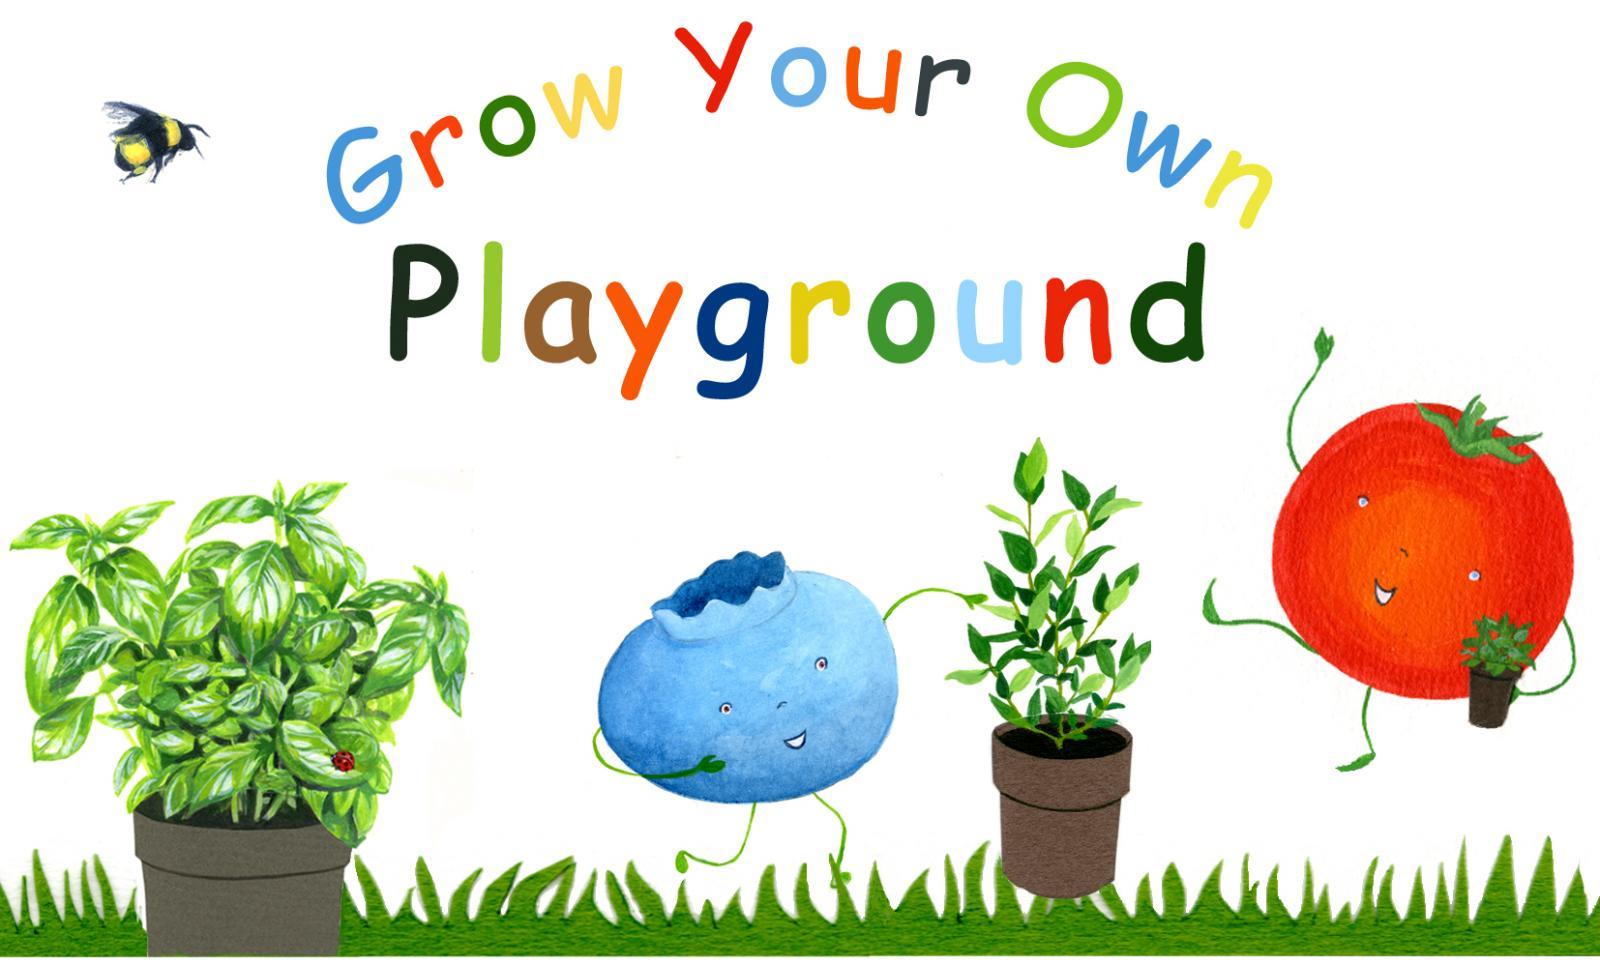 Credit: Cassie Liversidge at Grow Your Own Playground